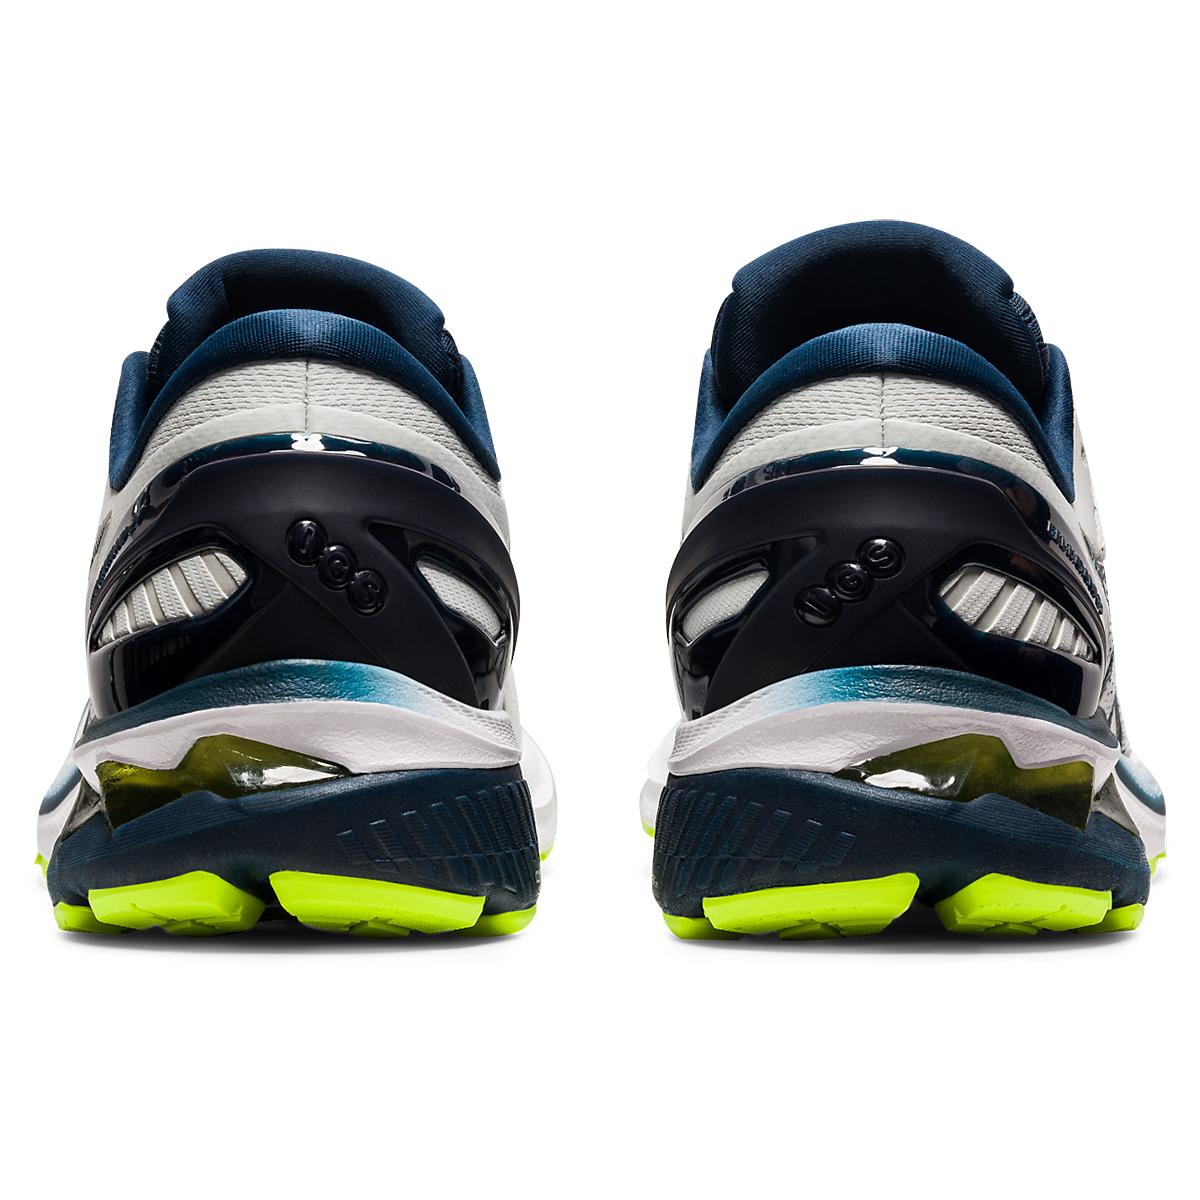 Men's Asics Gel-Kayano 27 Running Shoe - Color: Grey/Green/Blue - Size: 7 - Width: Regular, Grey/Green/Blue, large, image 5